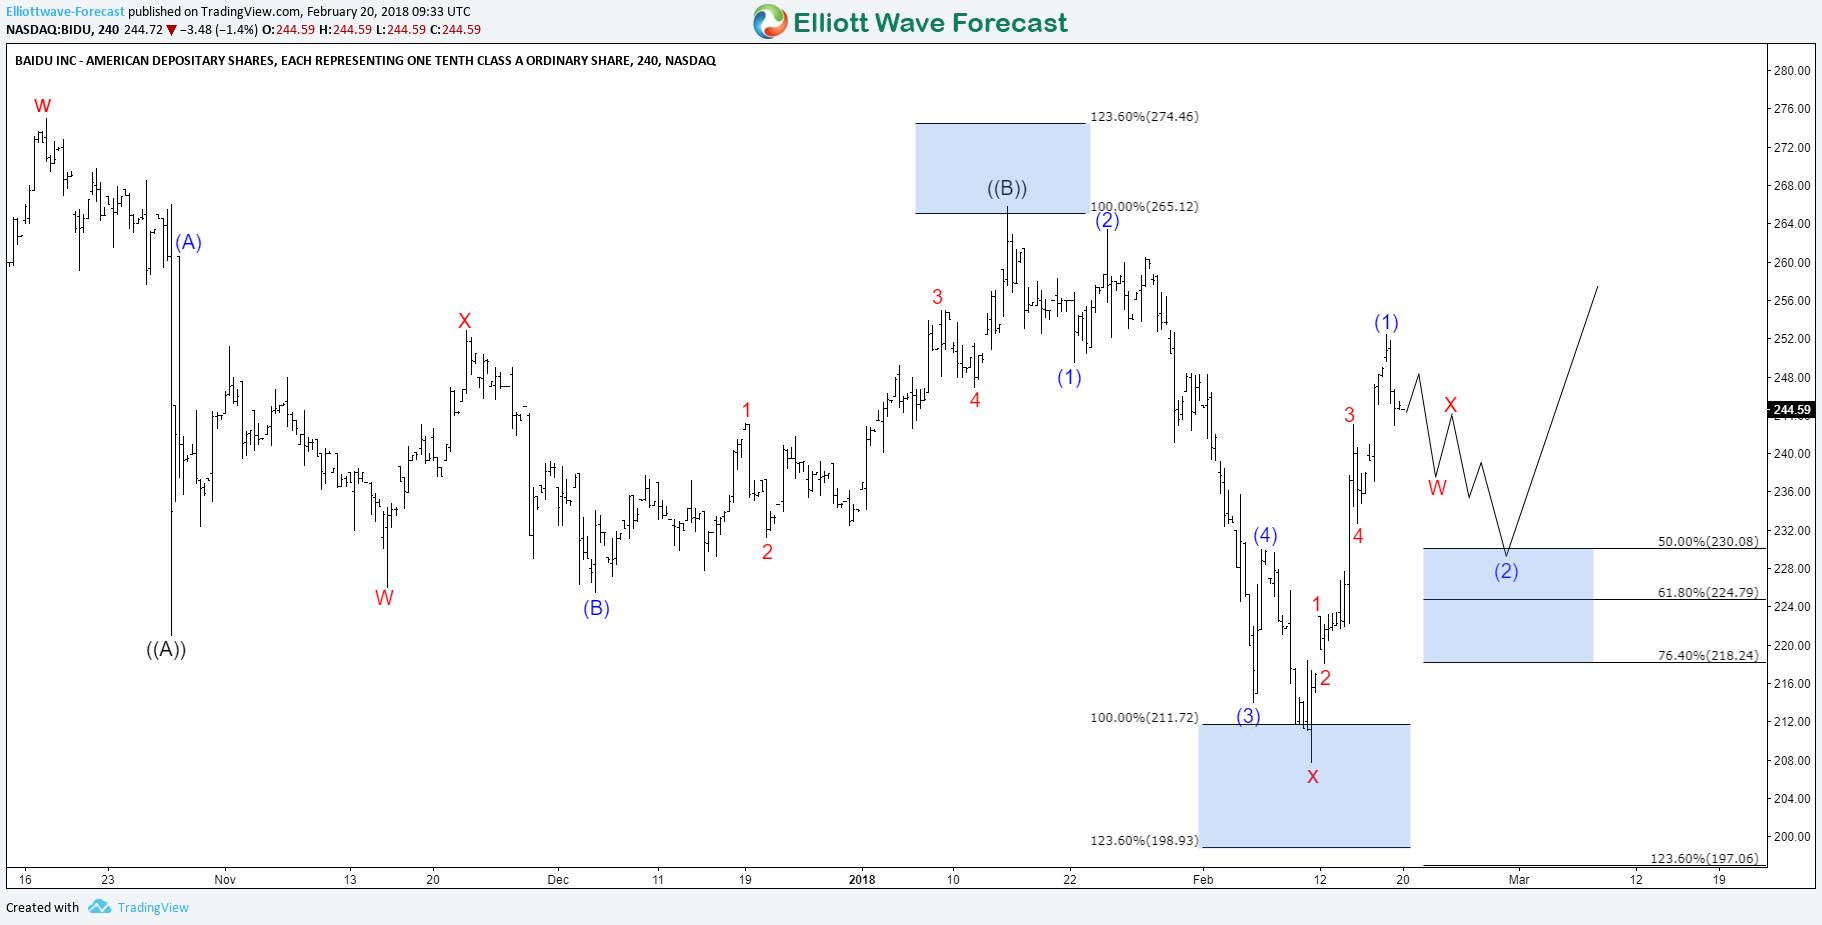 Barclays Raises Baidu (BIDU) Price Target to $250.00